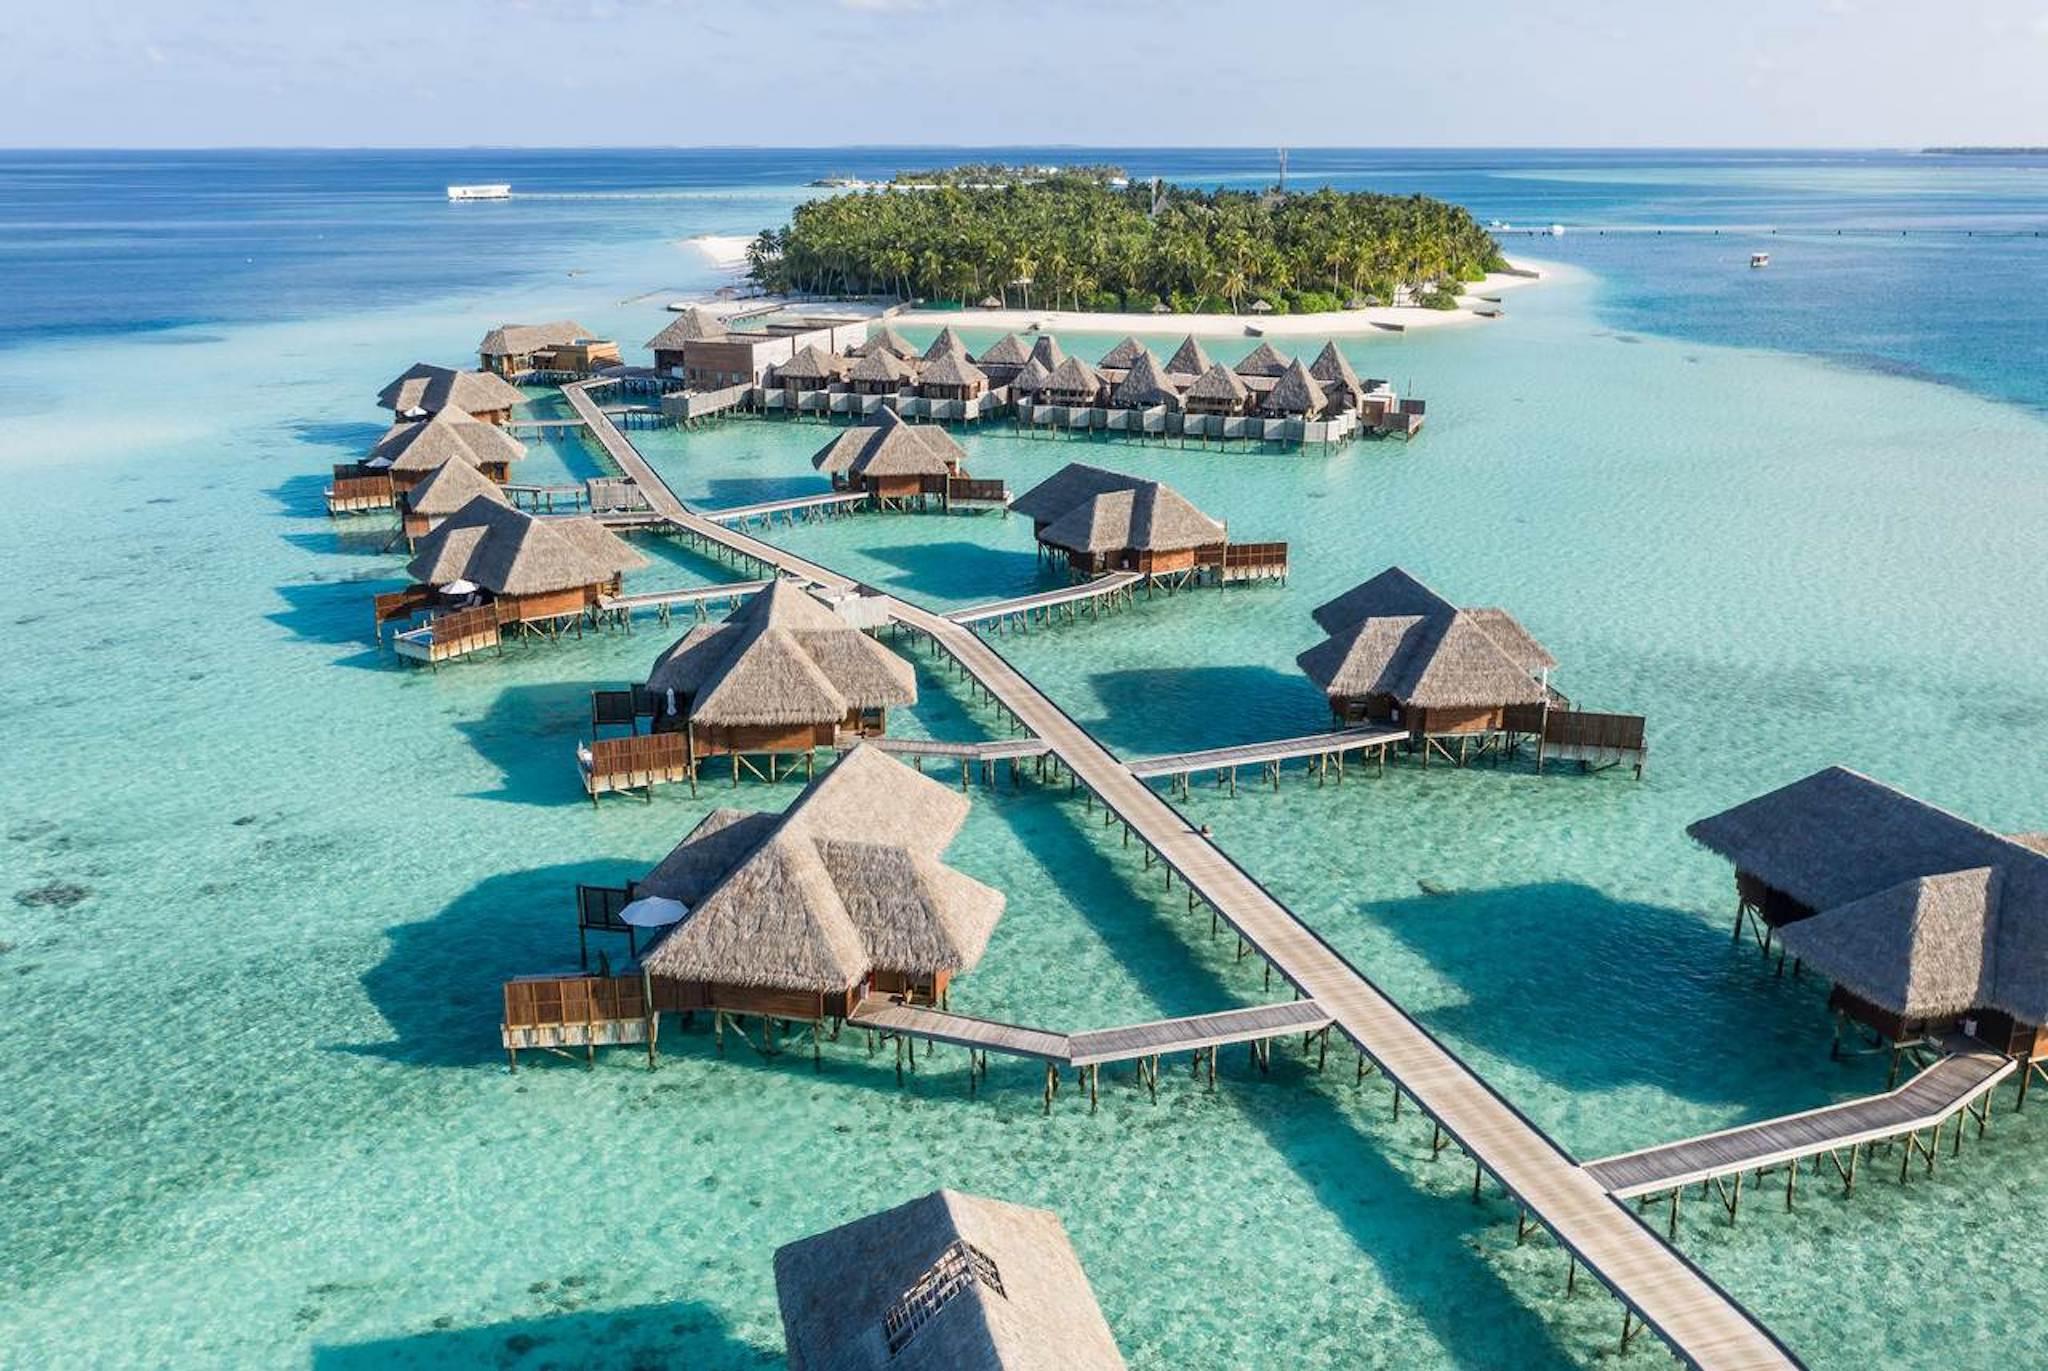 conrad_maldives_4.jpg